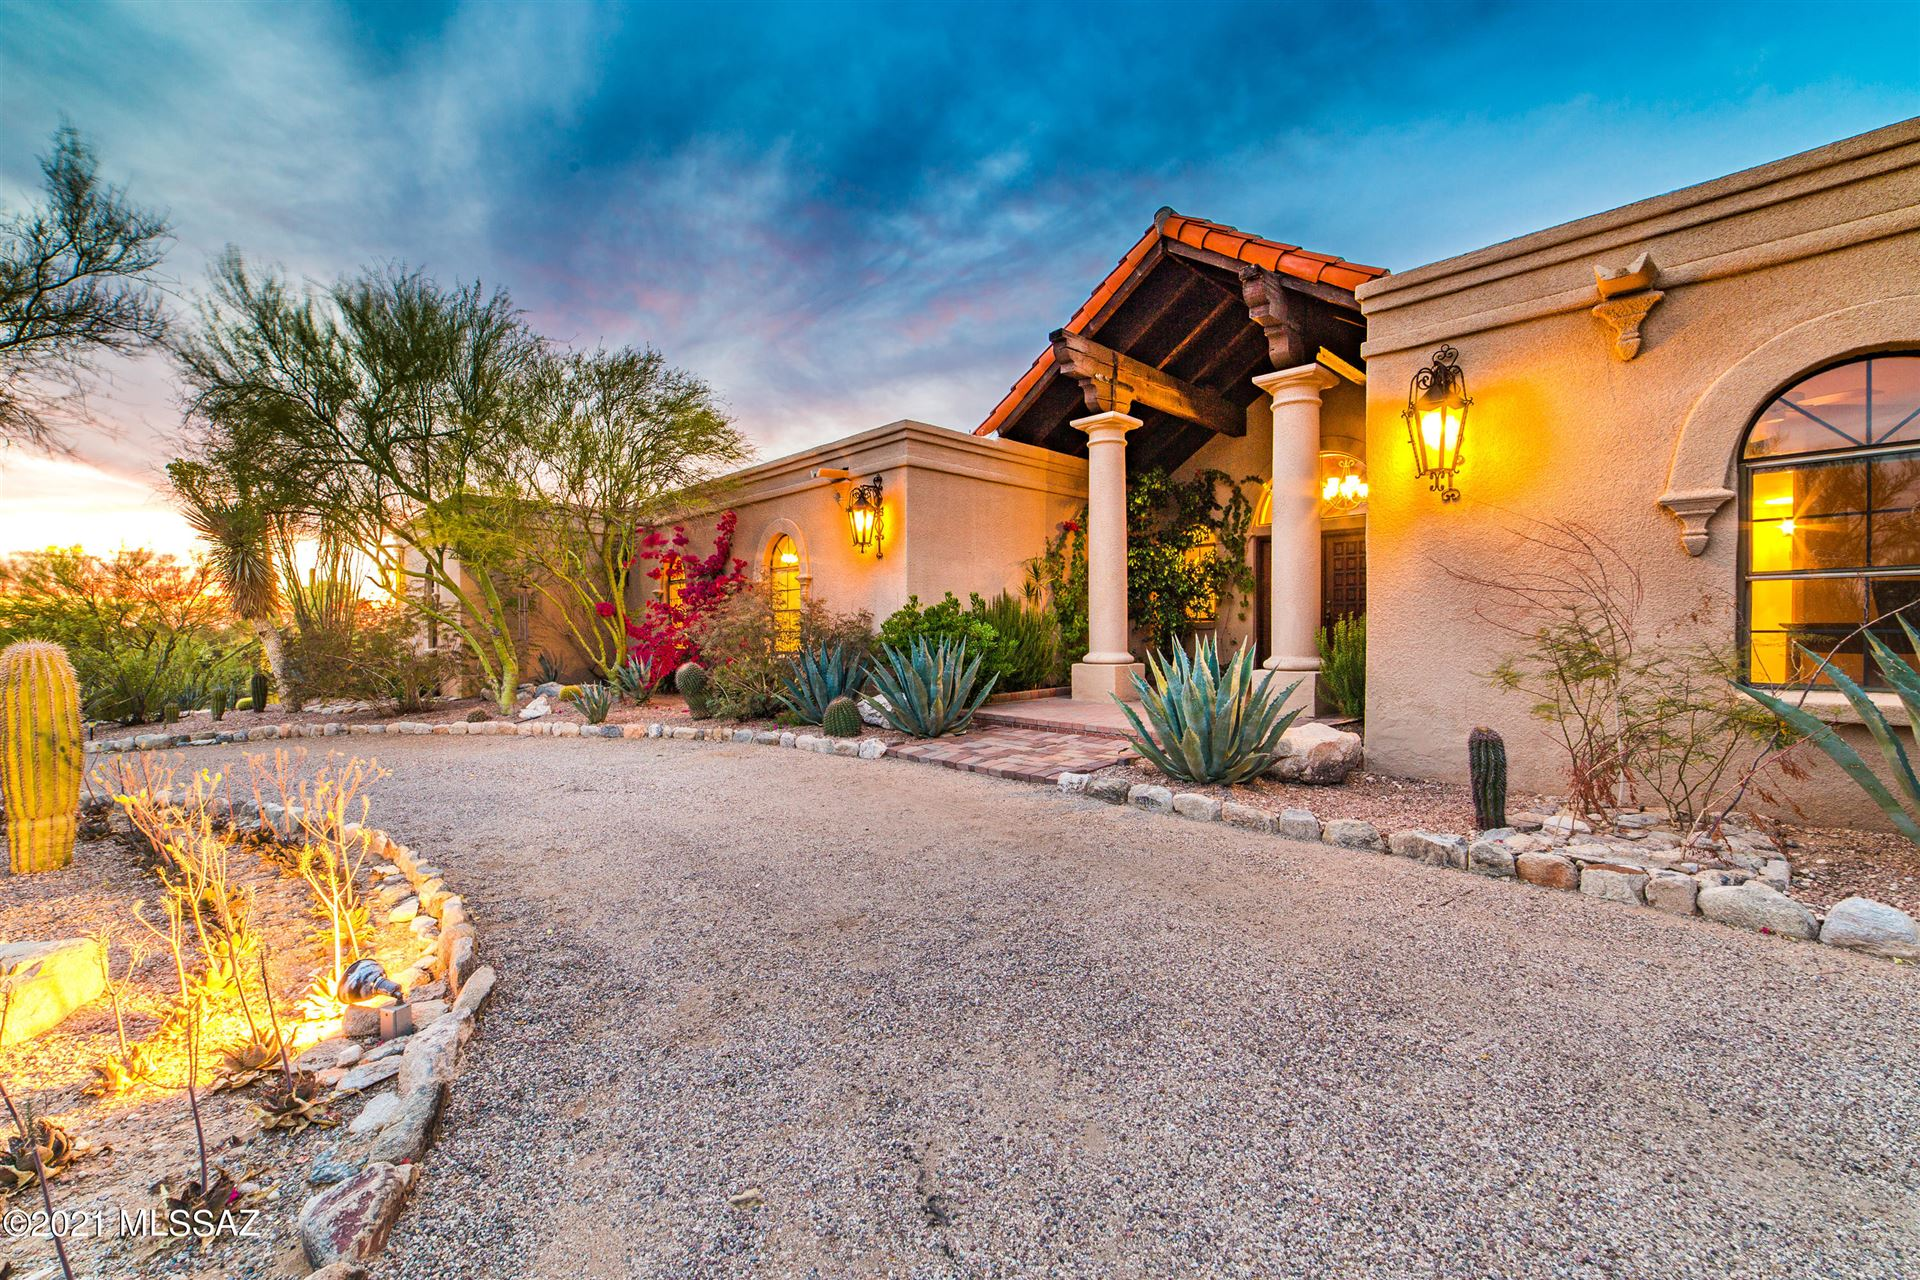 2321 E Camino La Zorrela, Tucson, AZ 85718 - MLS#: 22109913